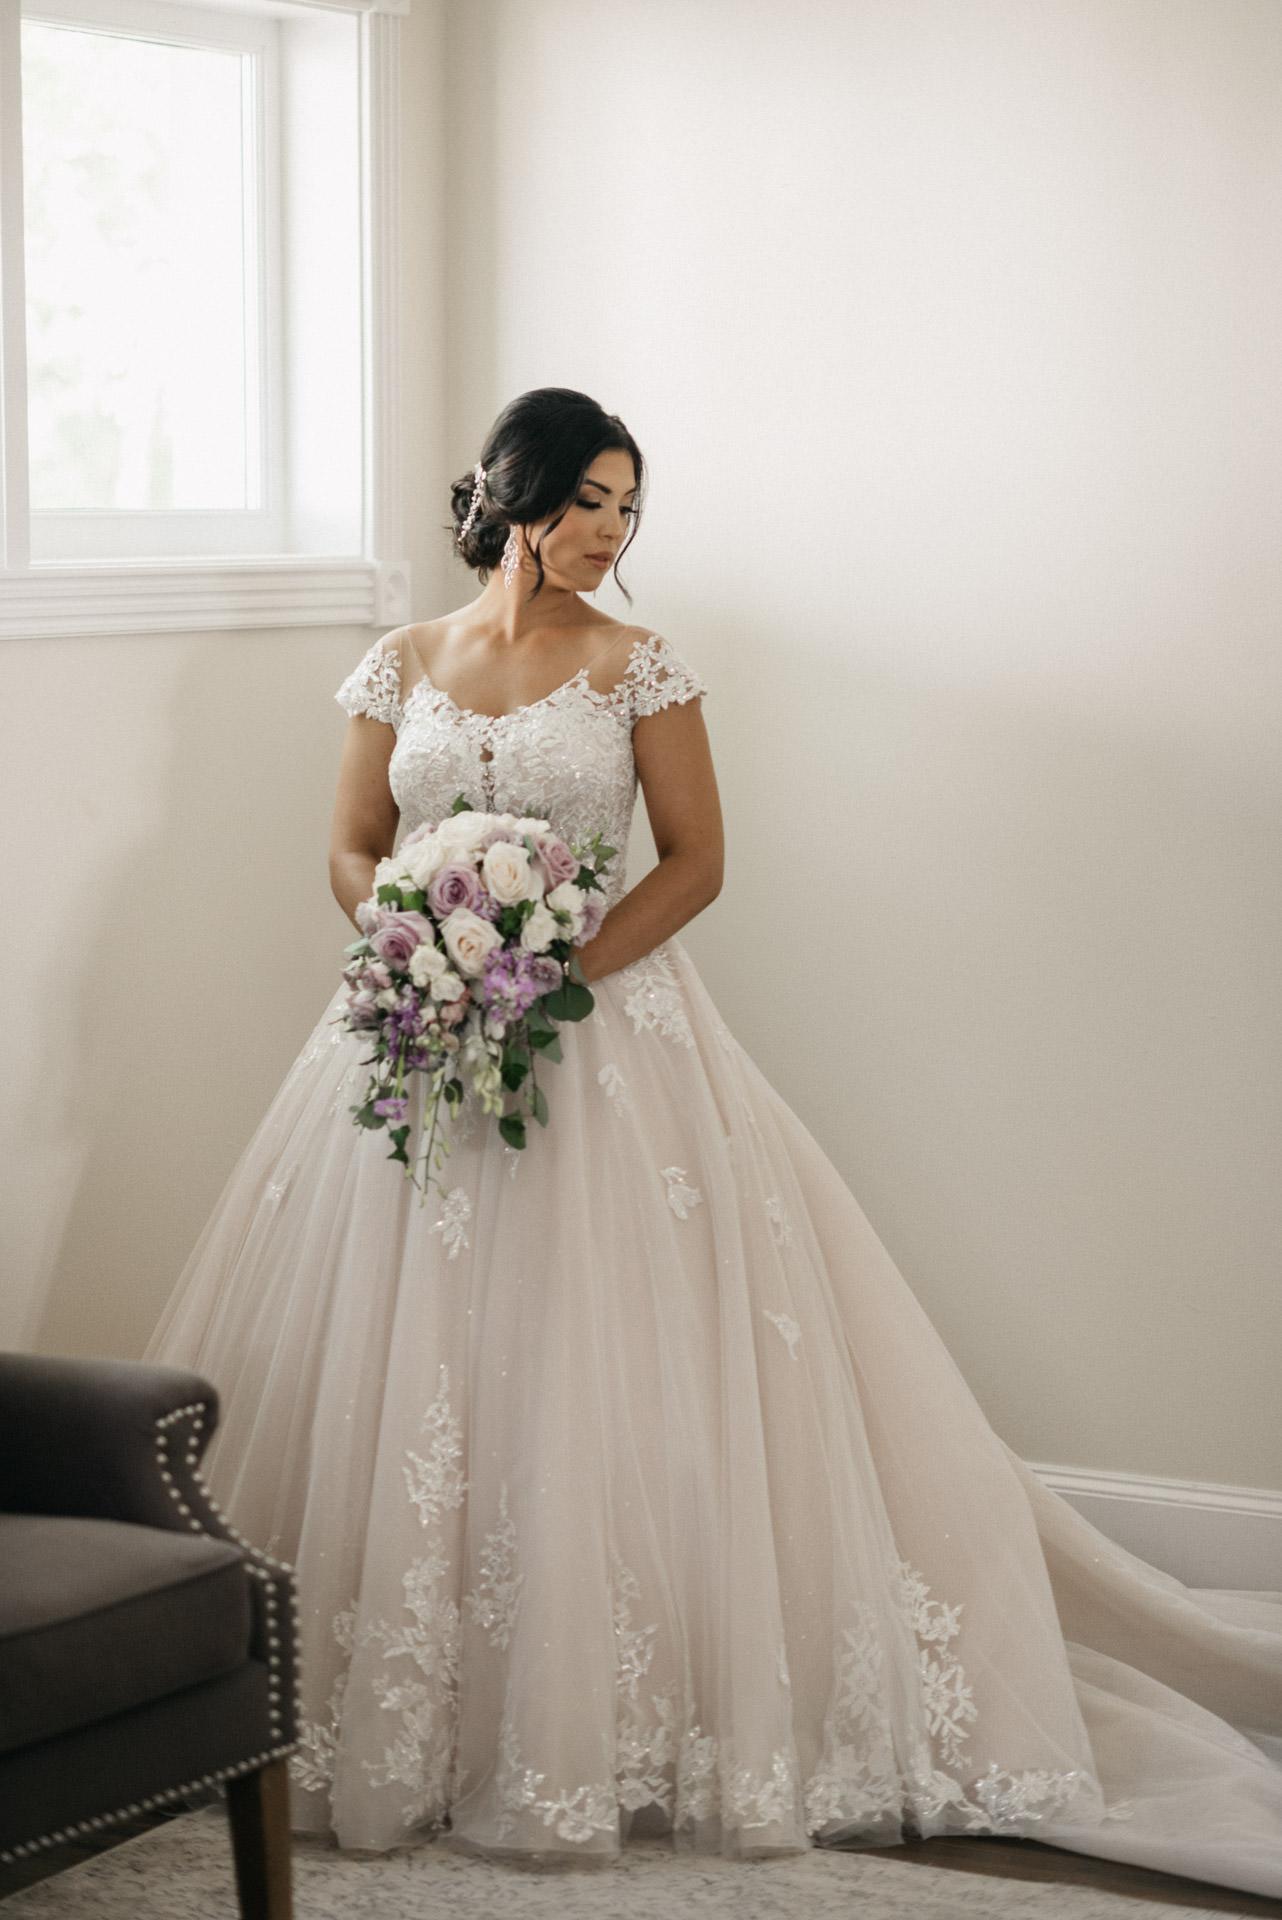 lexi-michael-wedding-blog-sm-31.jpg